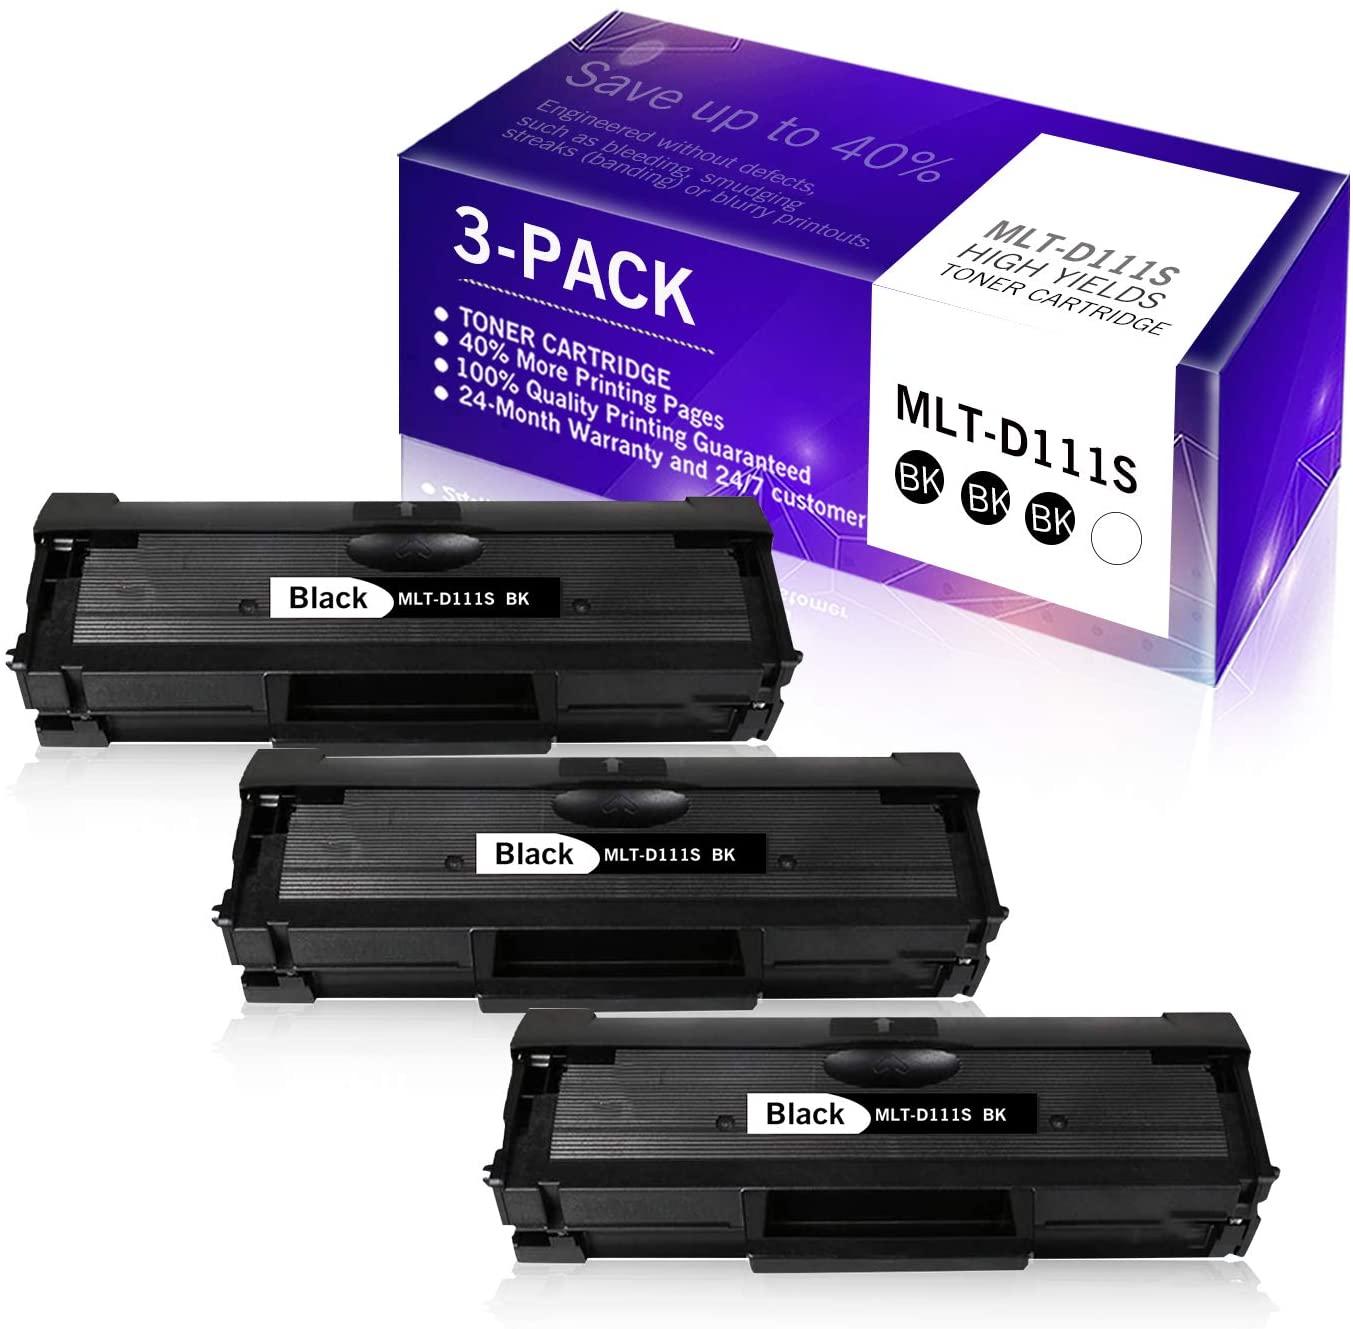 3-Pack Black Compatible Toner Cartridge Replacement for Samsung 111S 111L MLT-D111S MLT-D111L to Use with Samsung Xpress M2020W M2070FW M2070W Printer